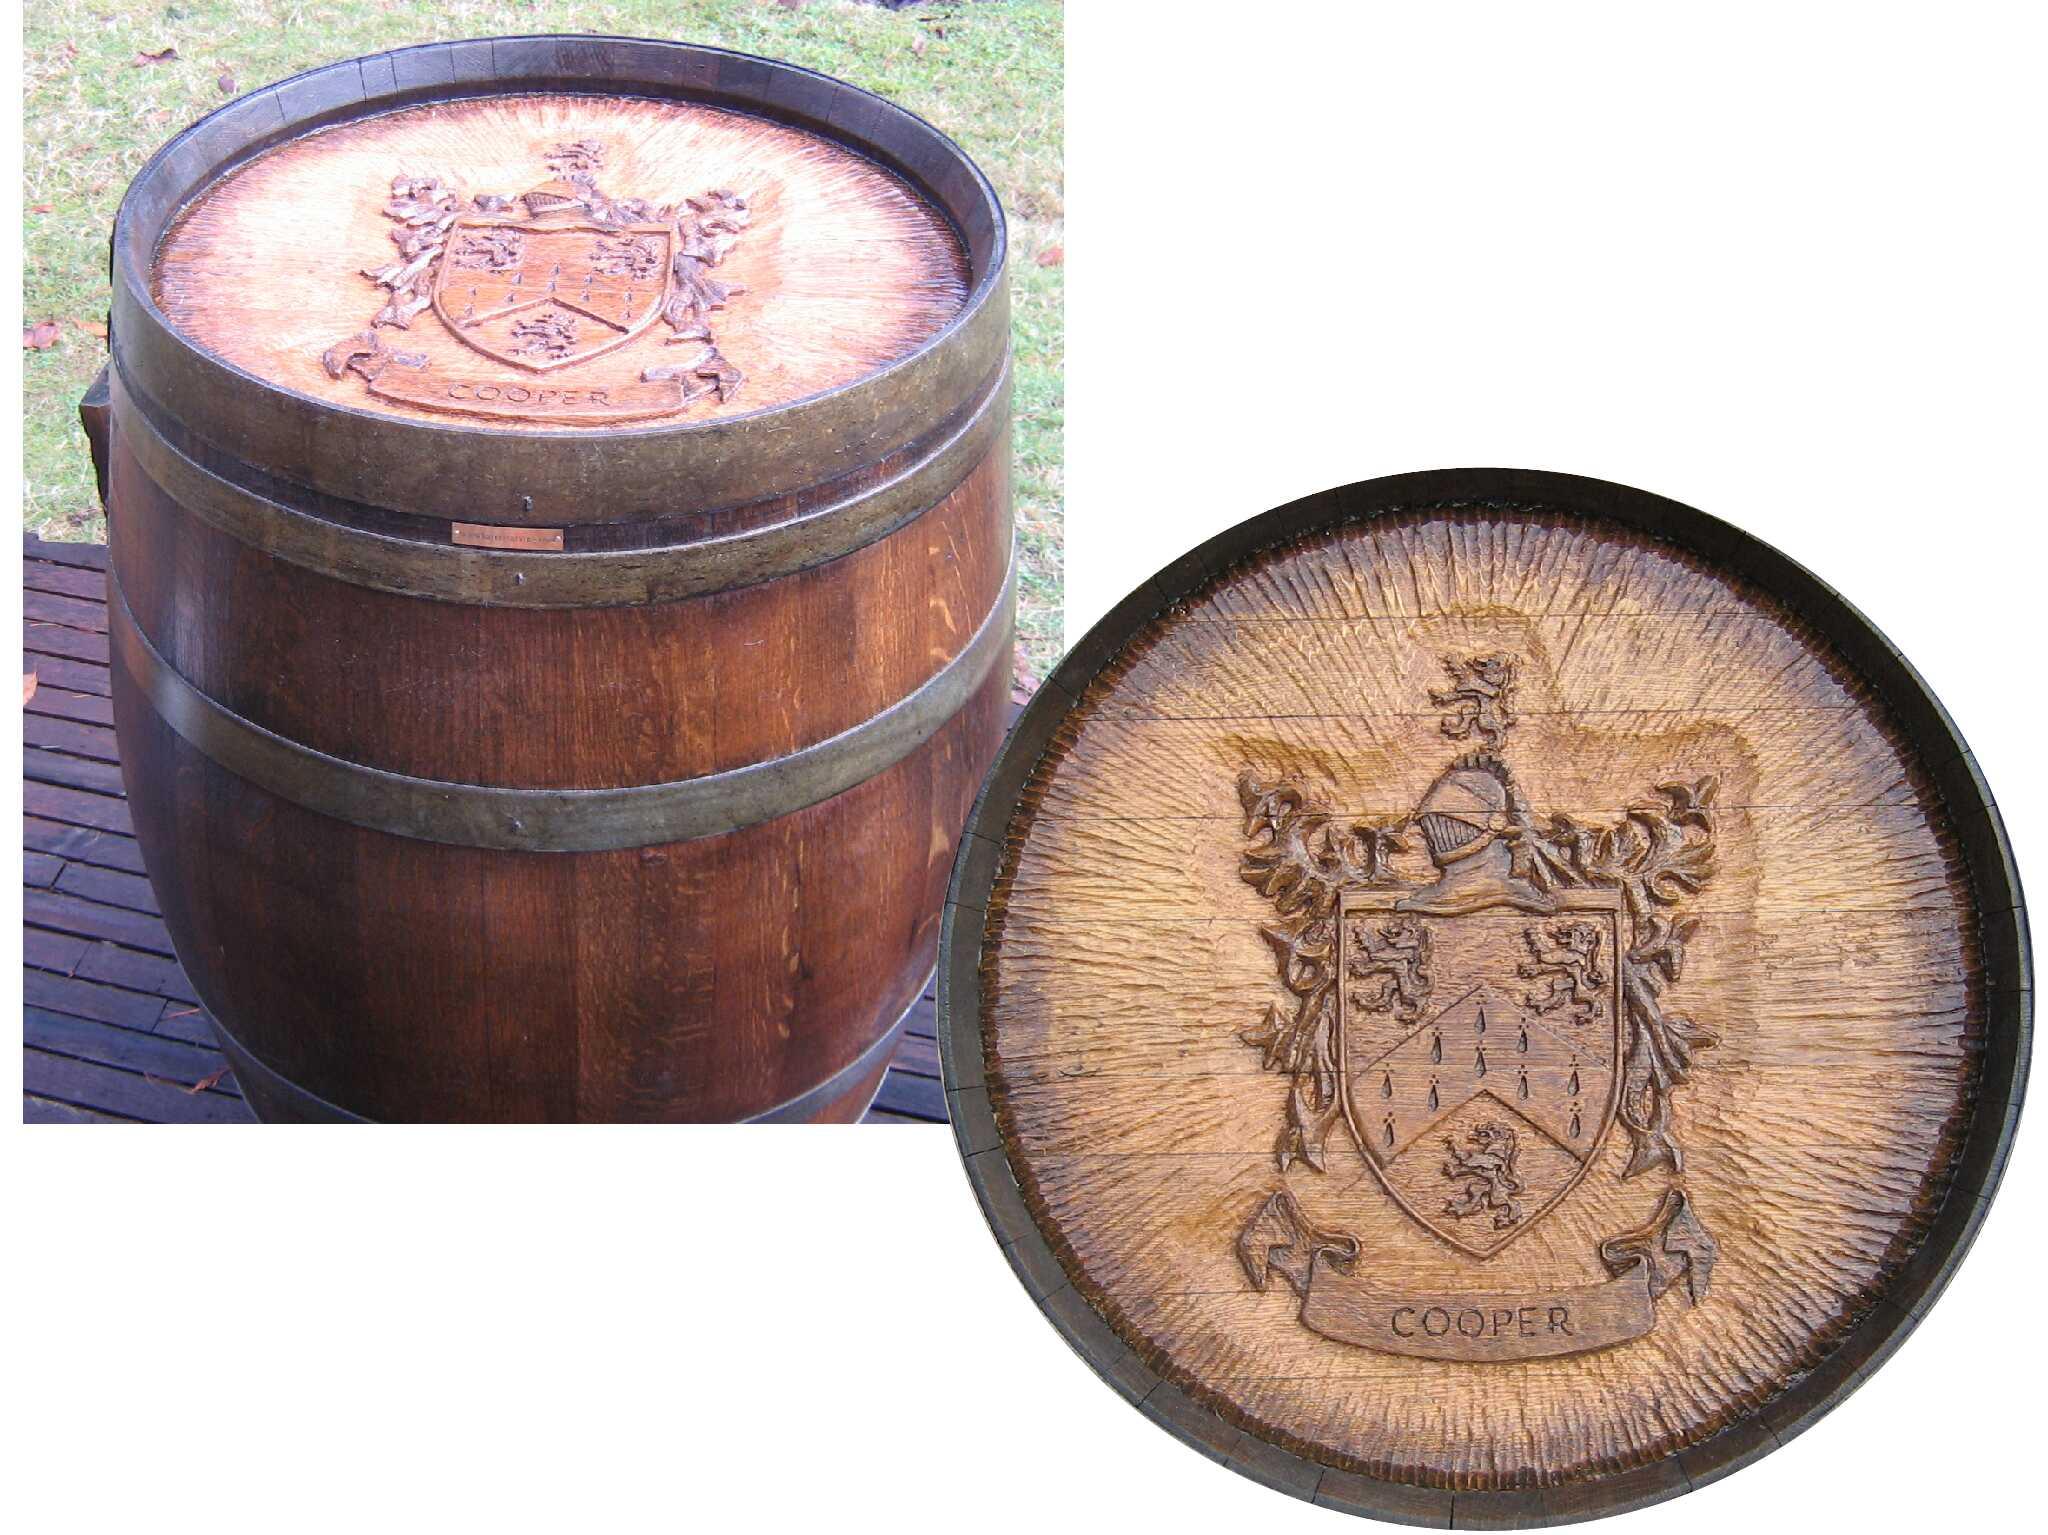 Wine Barrel Carvings for Wine Tasting Tables